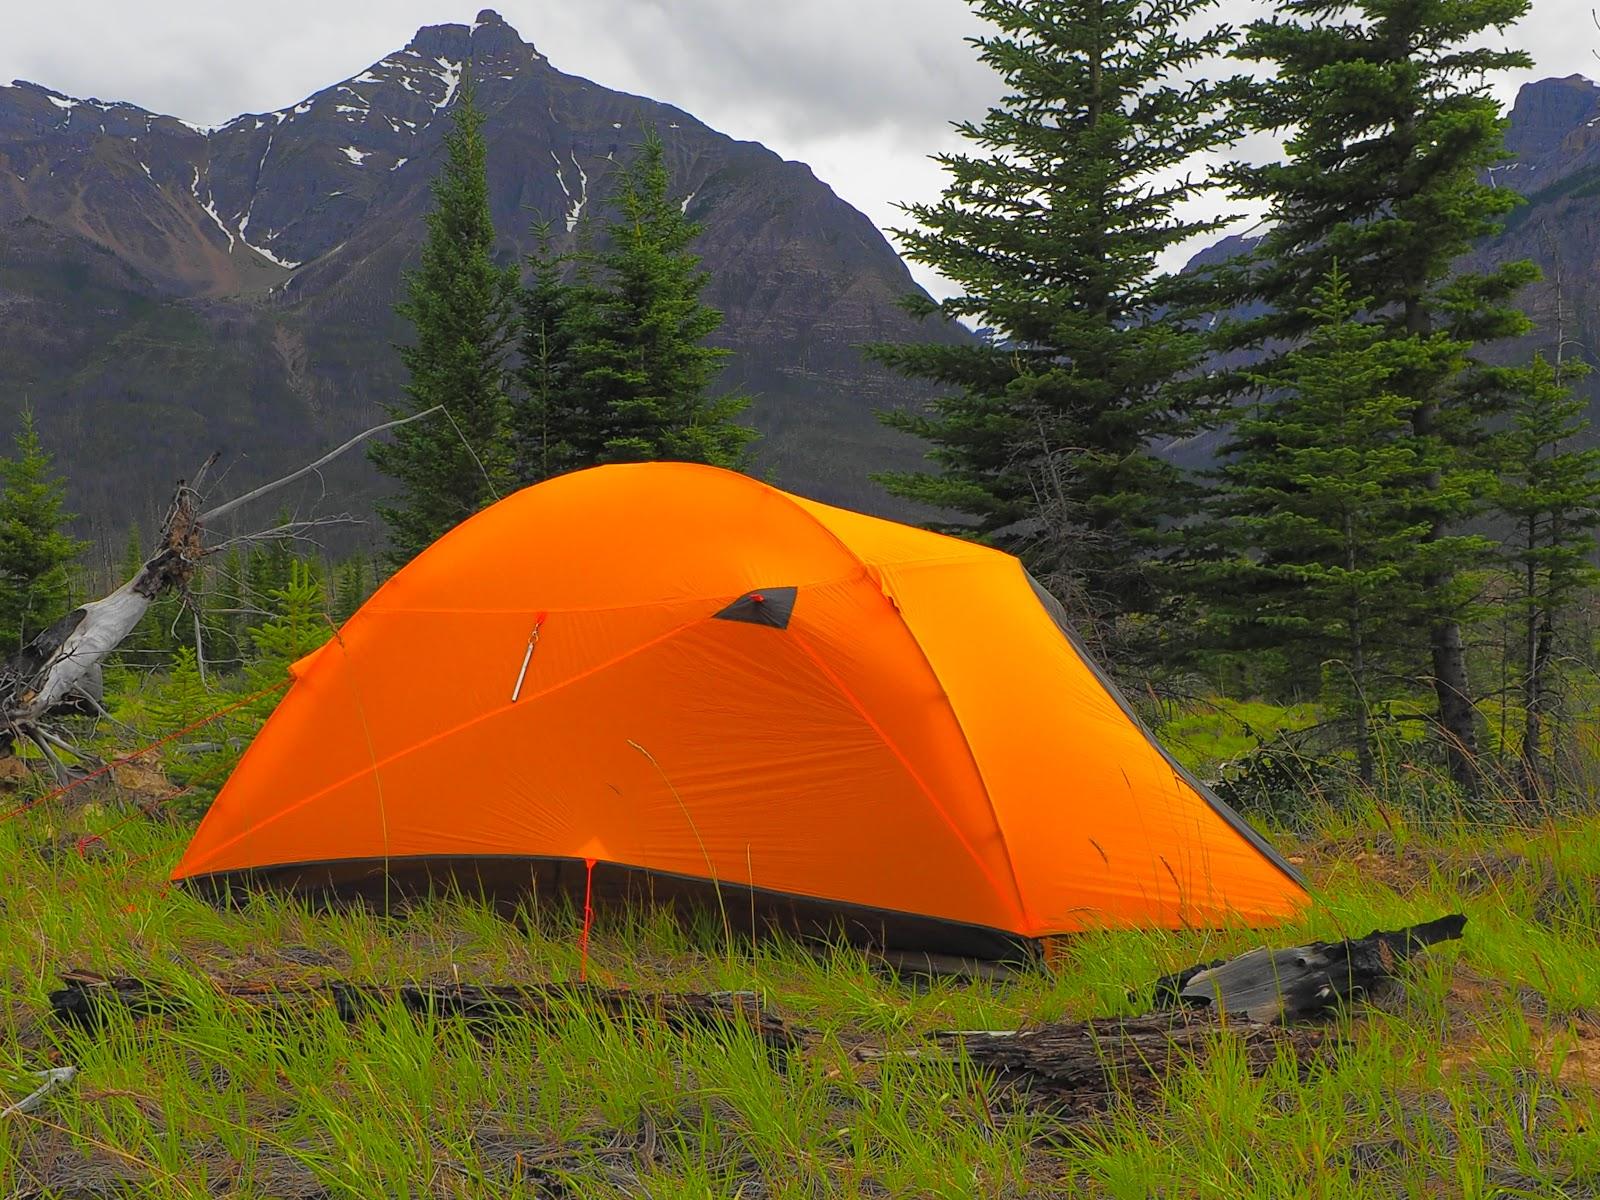 nemo kunai 2p tent at corona creek